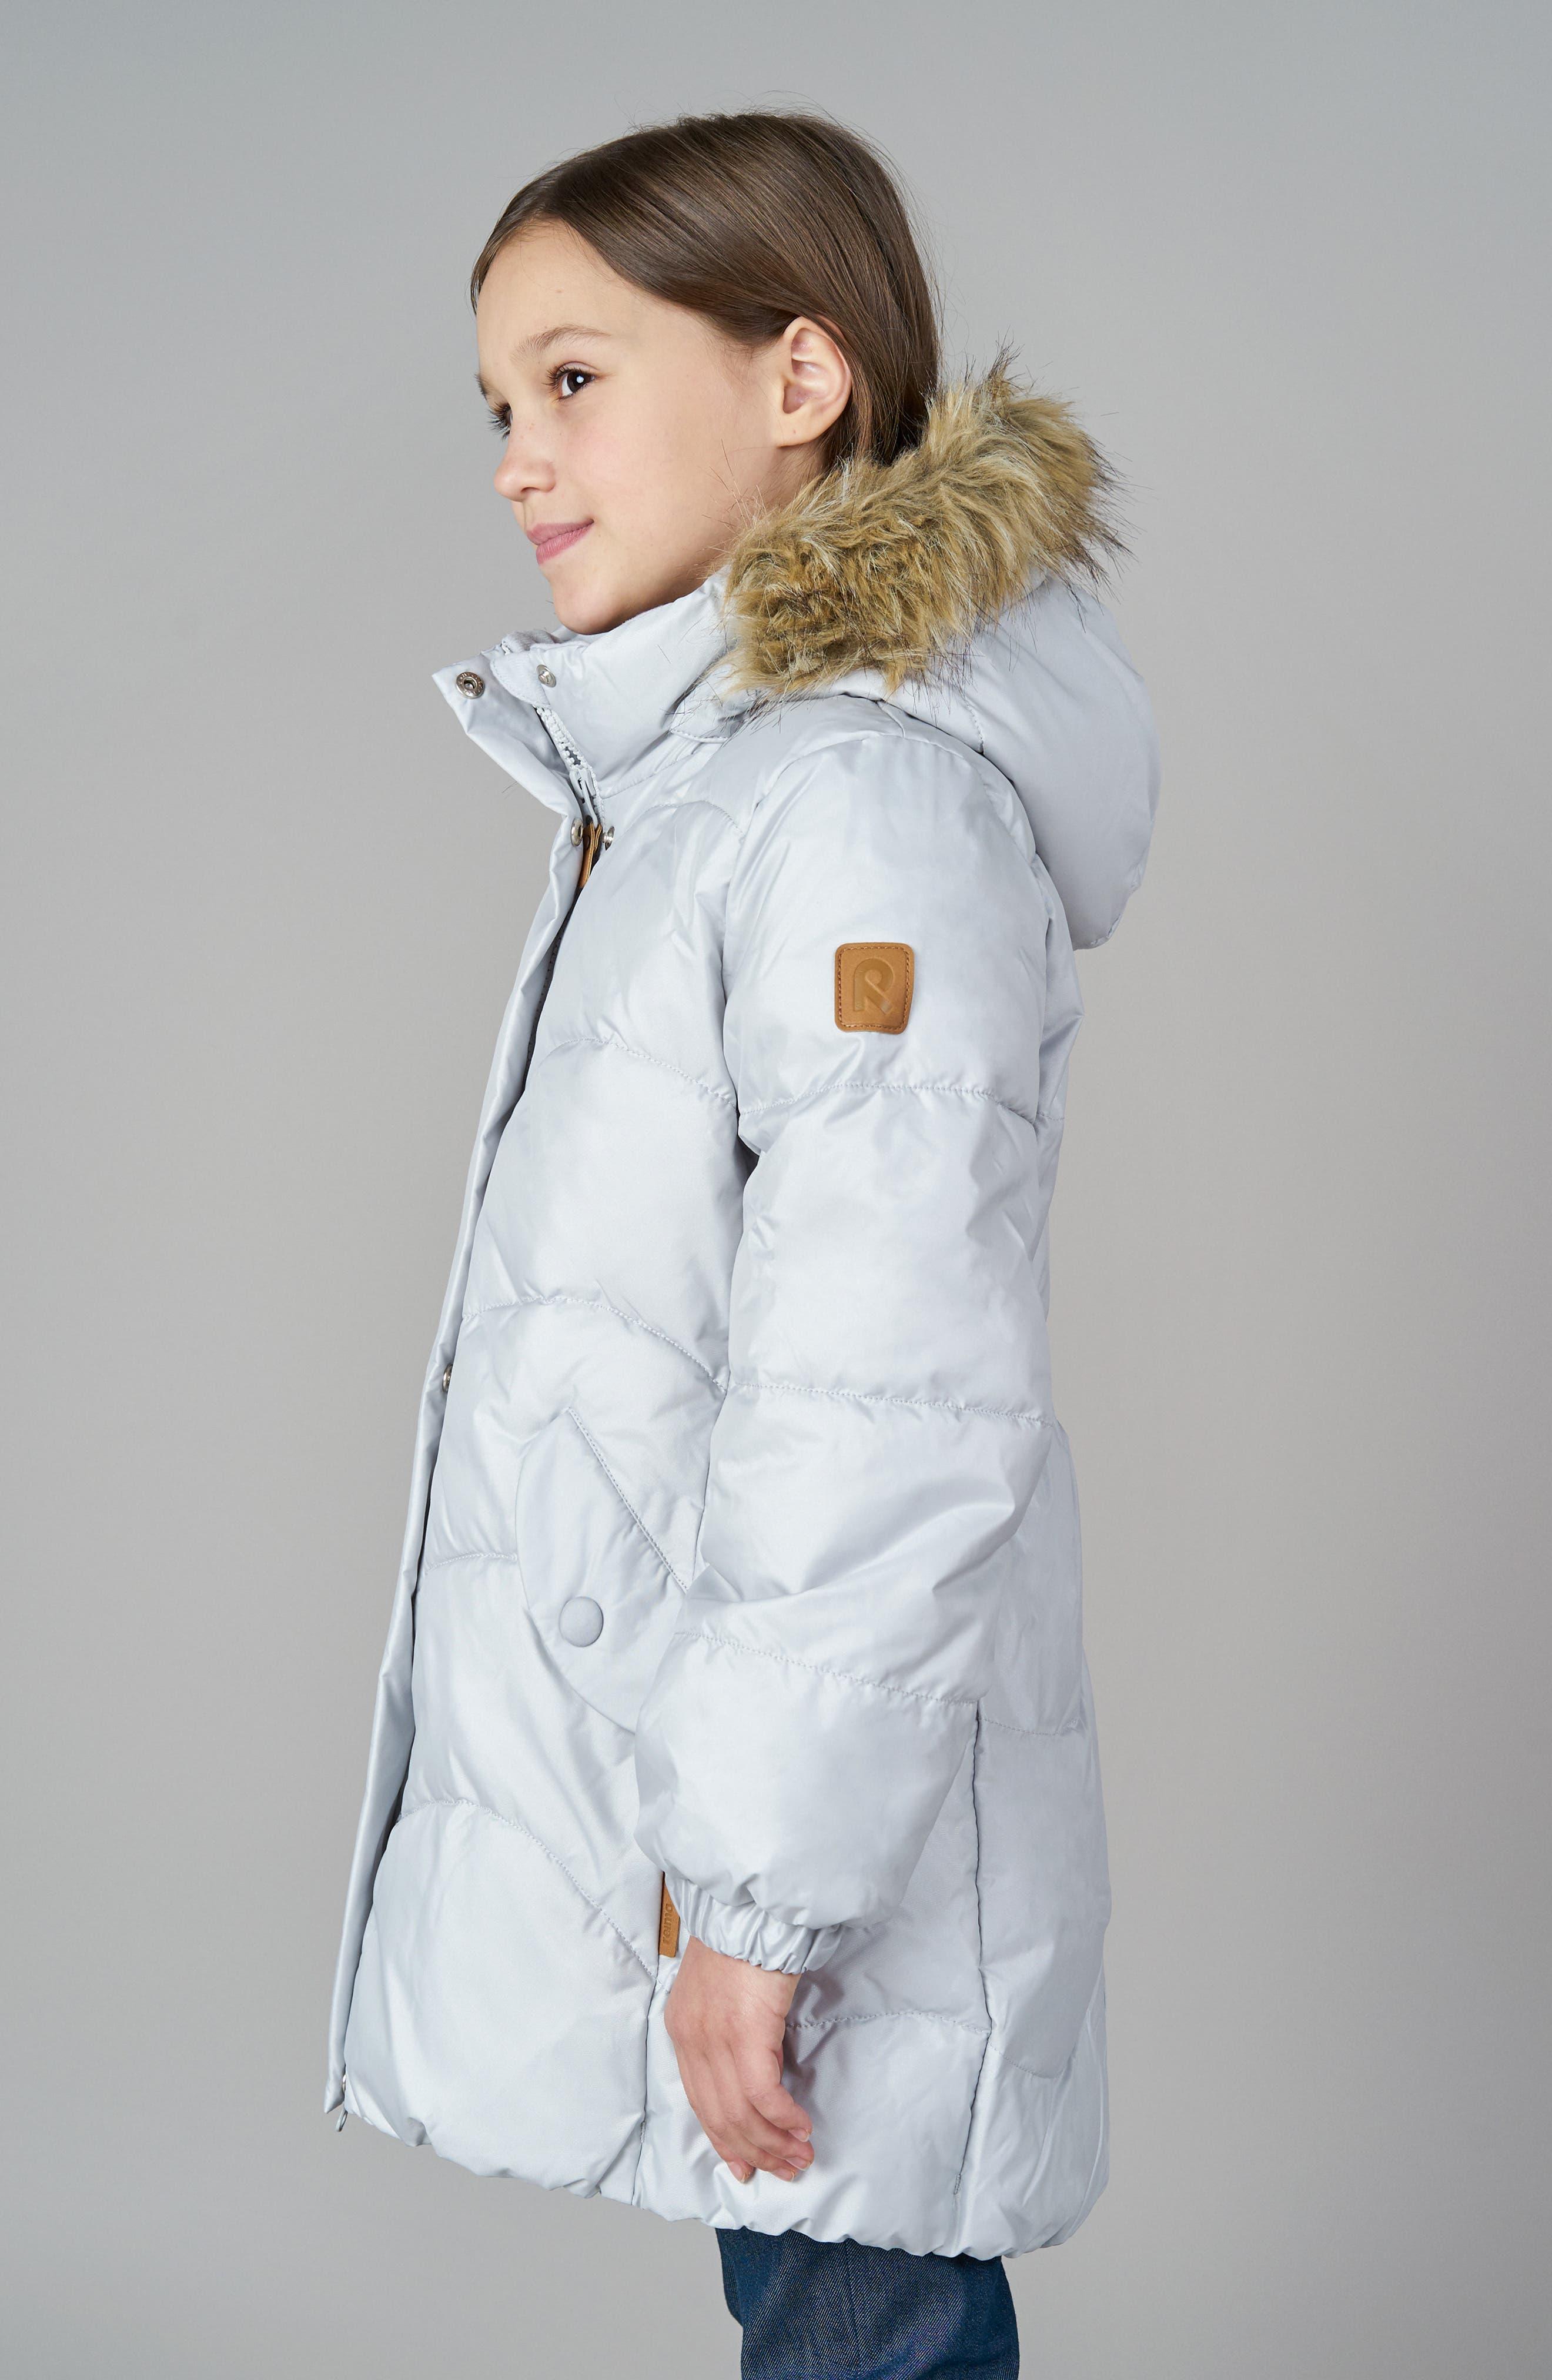 Sula Waterproof Winter Jacket,                             Alternate thumbnail 4, color,                             100